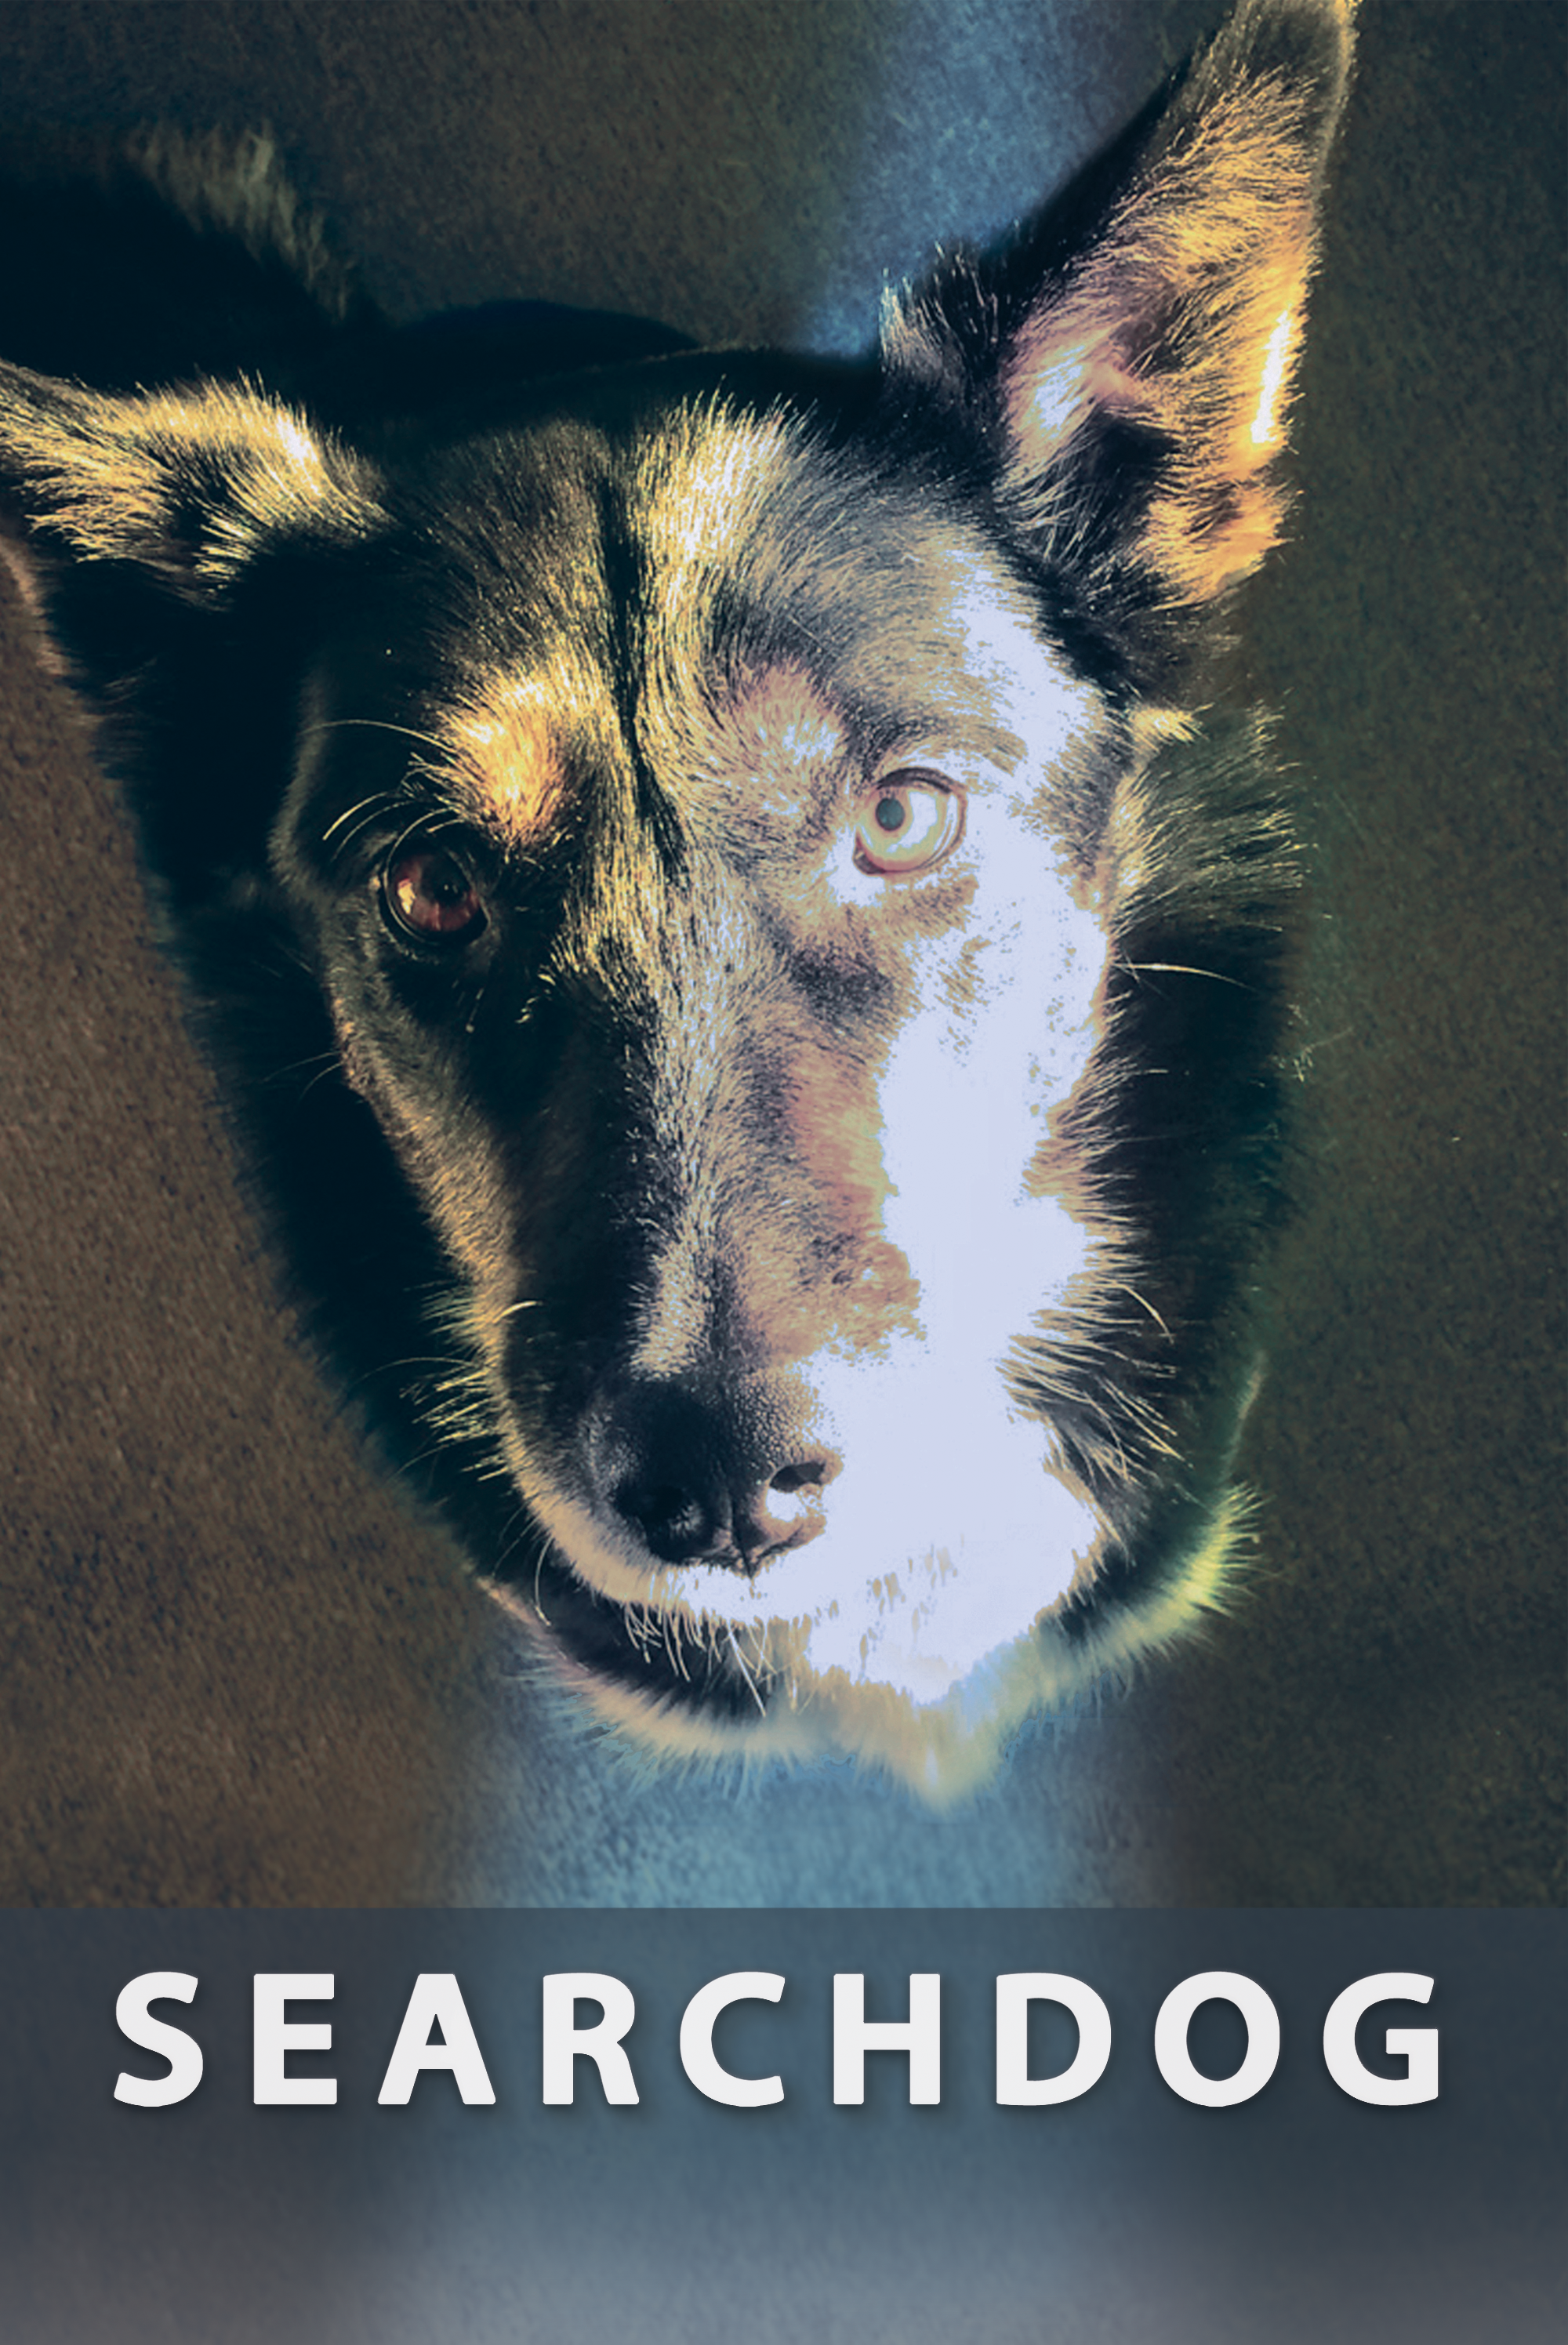 Searchdog Screening with Mary Healey Jamiel